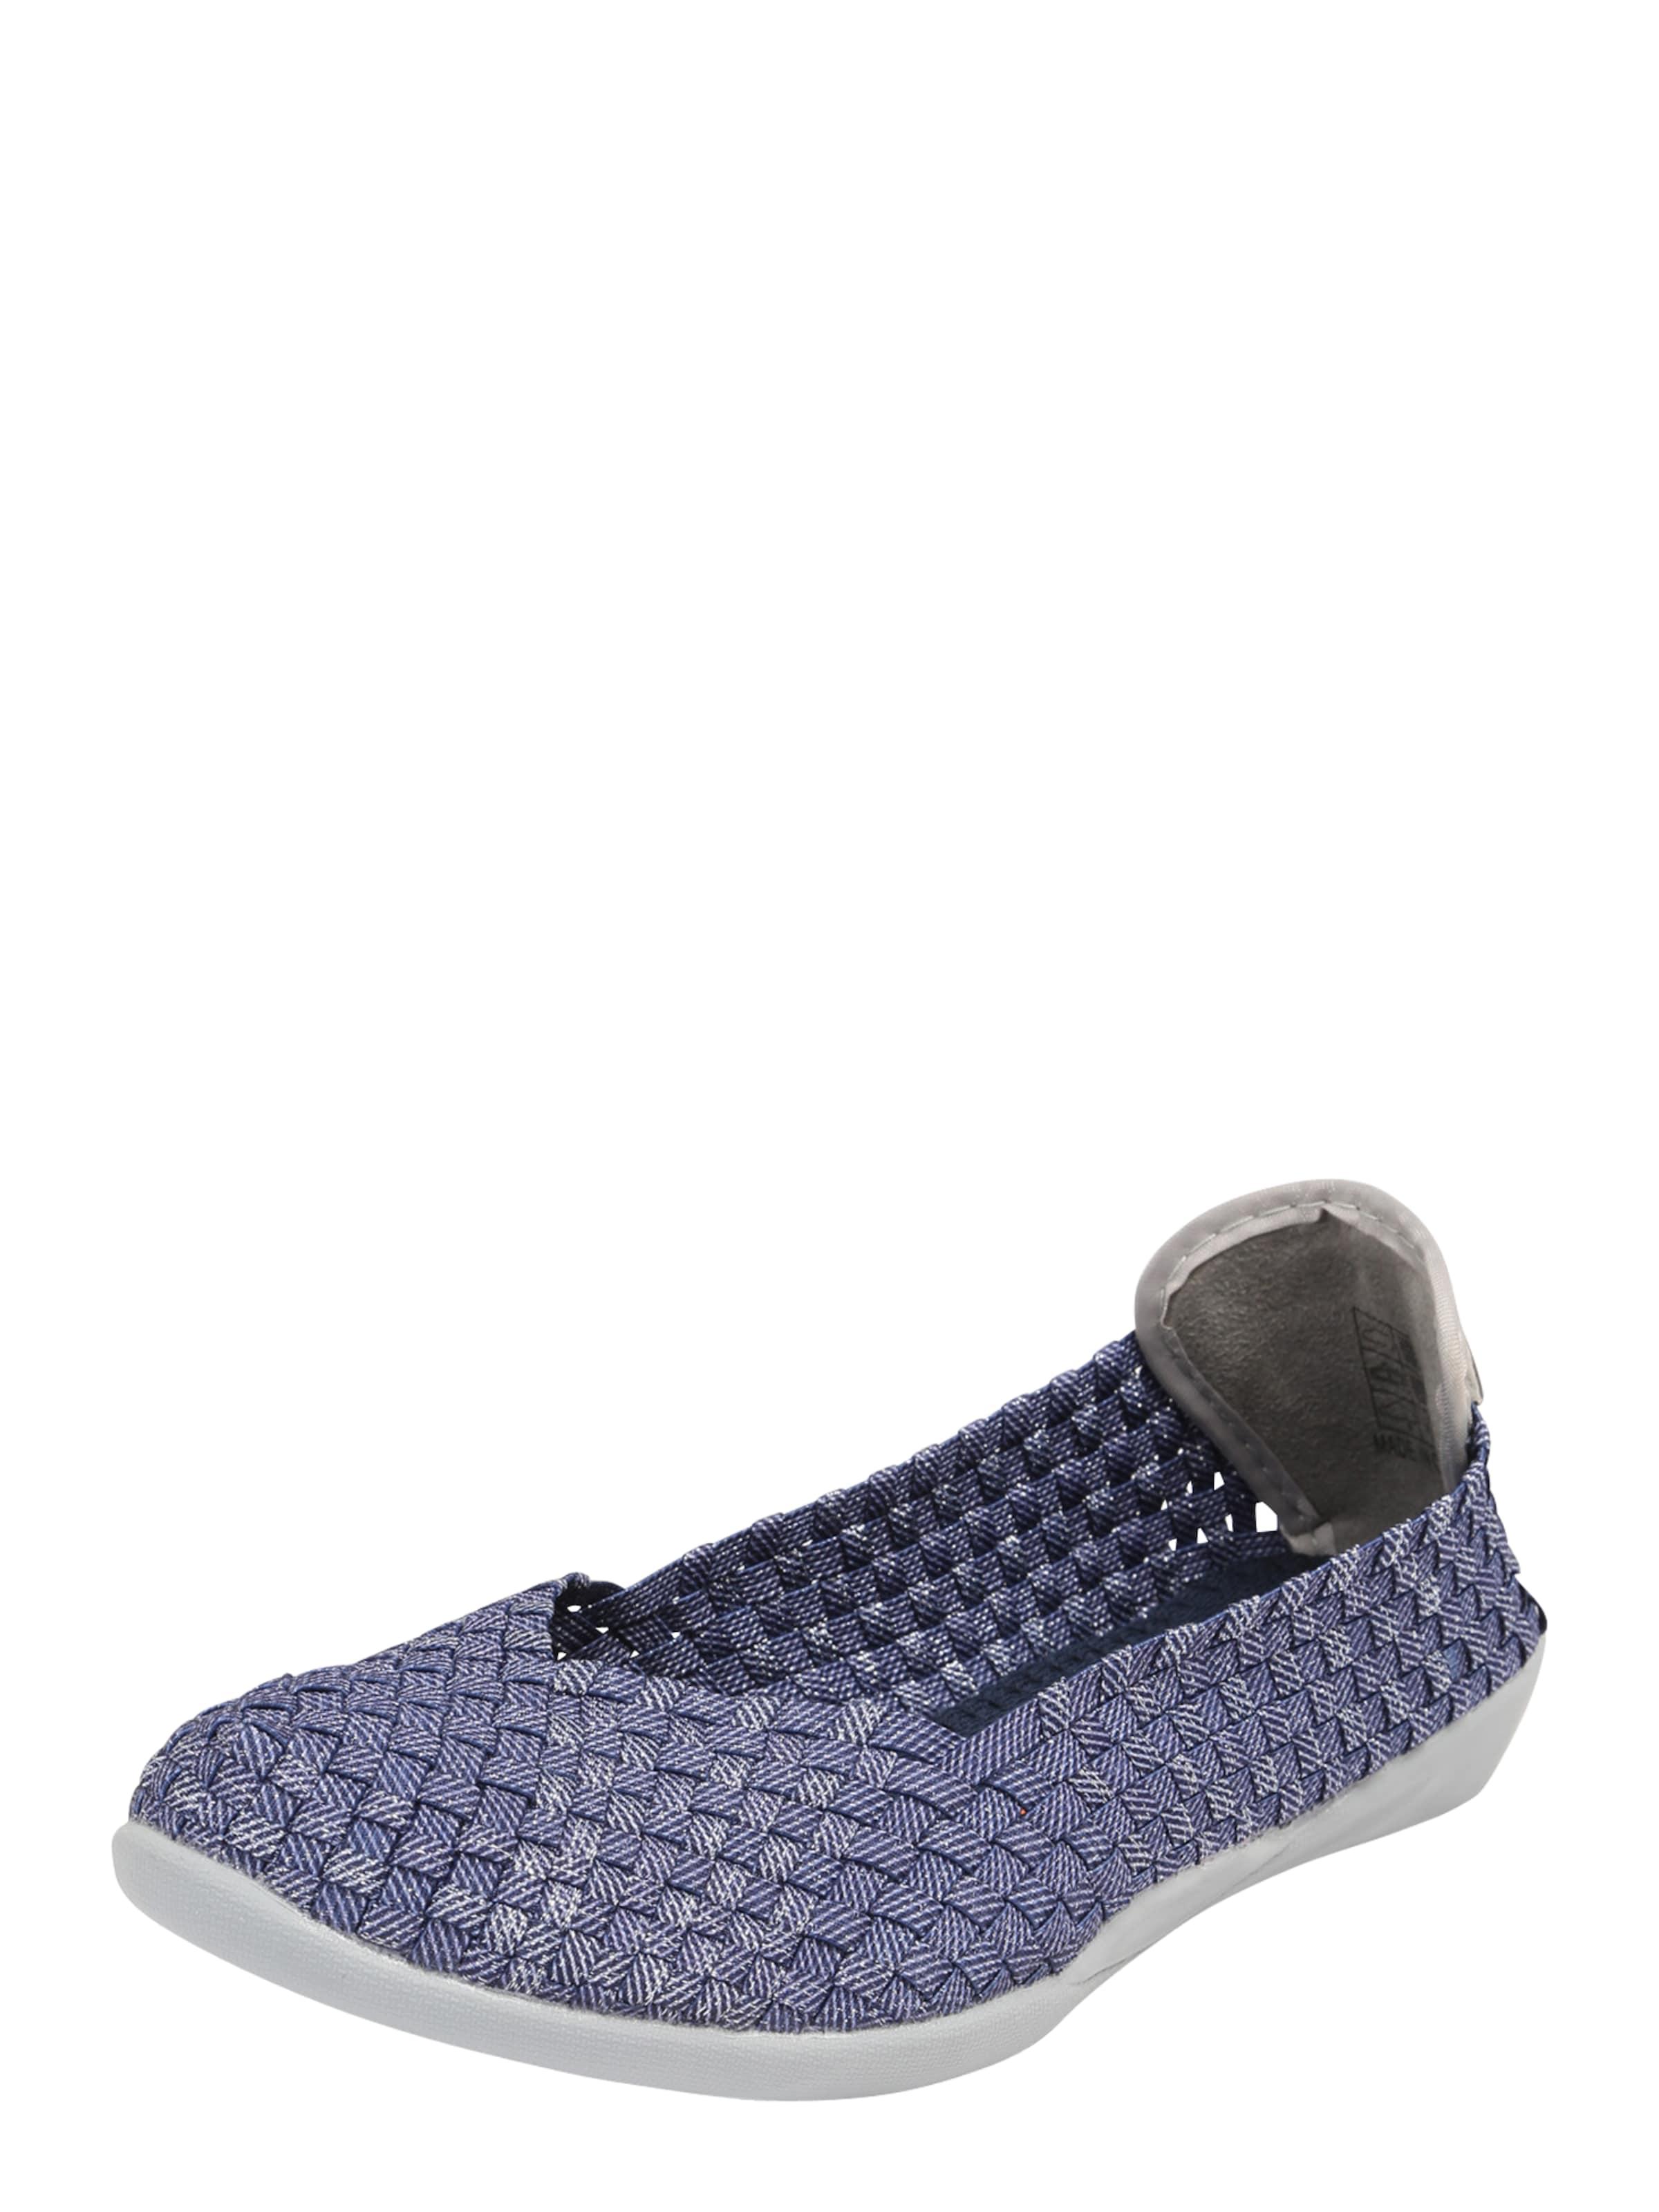 Haltbare Mode billige Schuhe Bernie Mev | Slipper 'CATWALK' Schuhe Gut getragene Schuhe